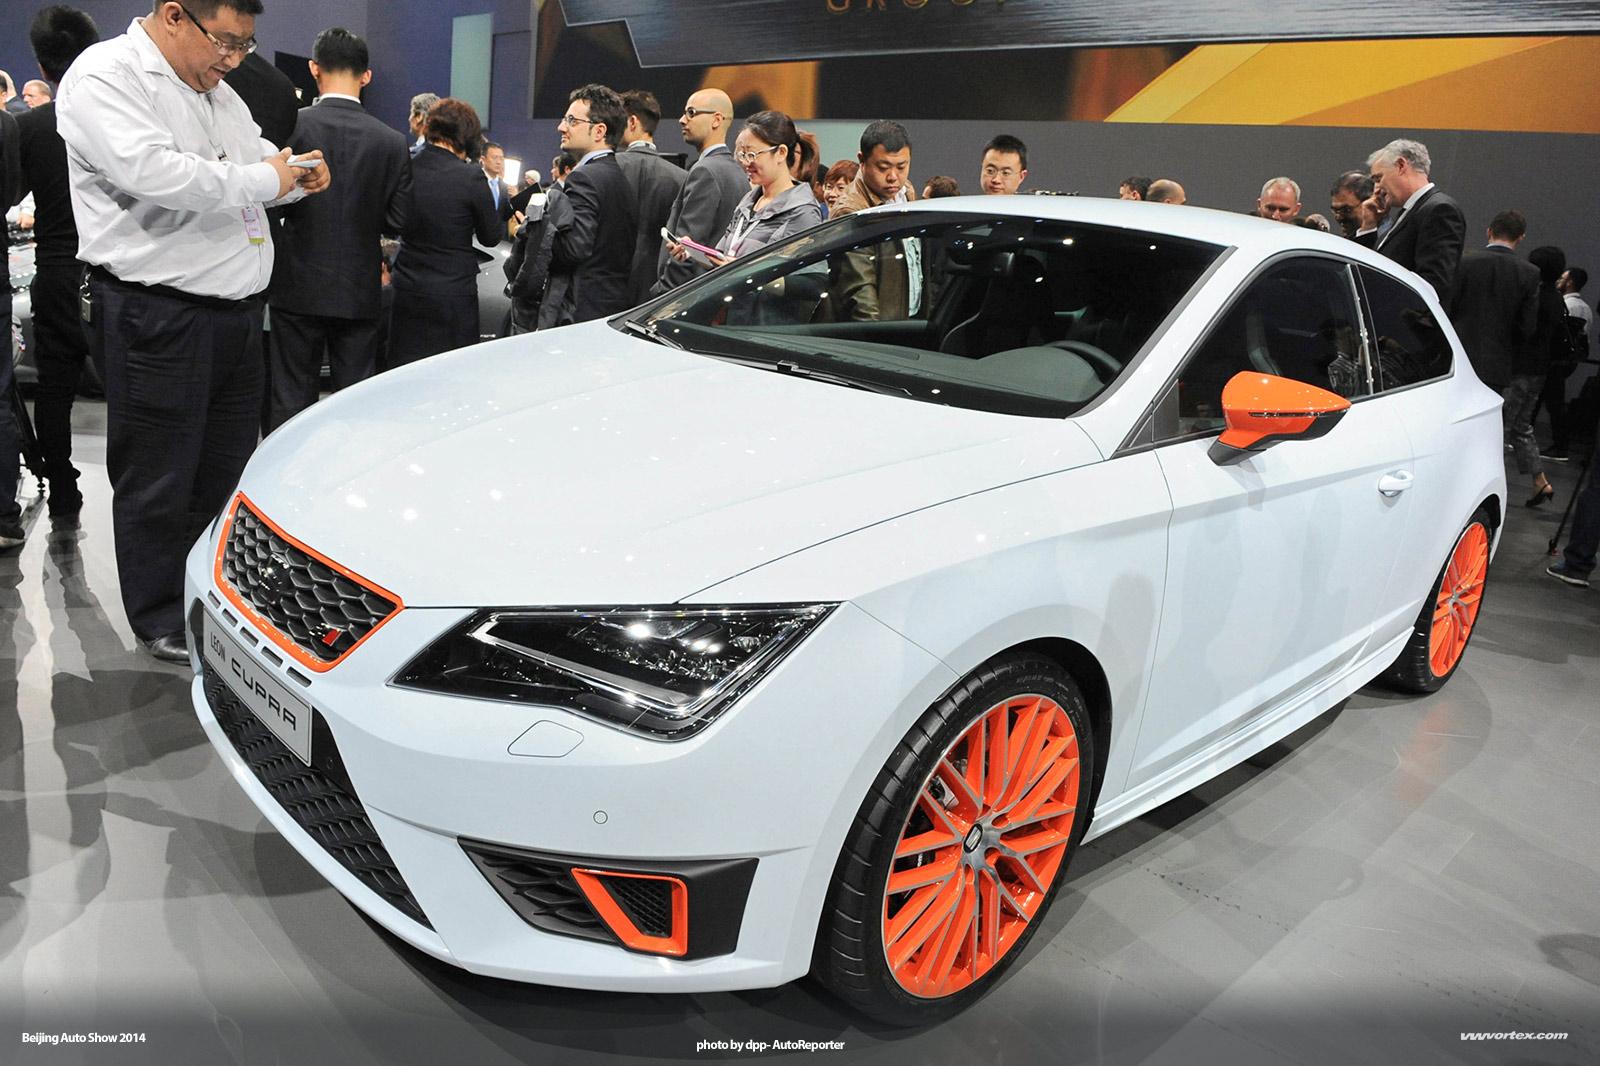 Audi RS 7 Sportback (photo: Audi Australia)